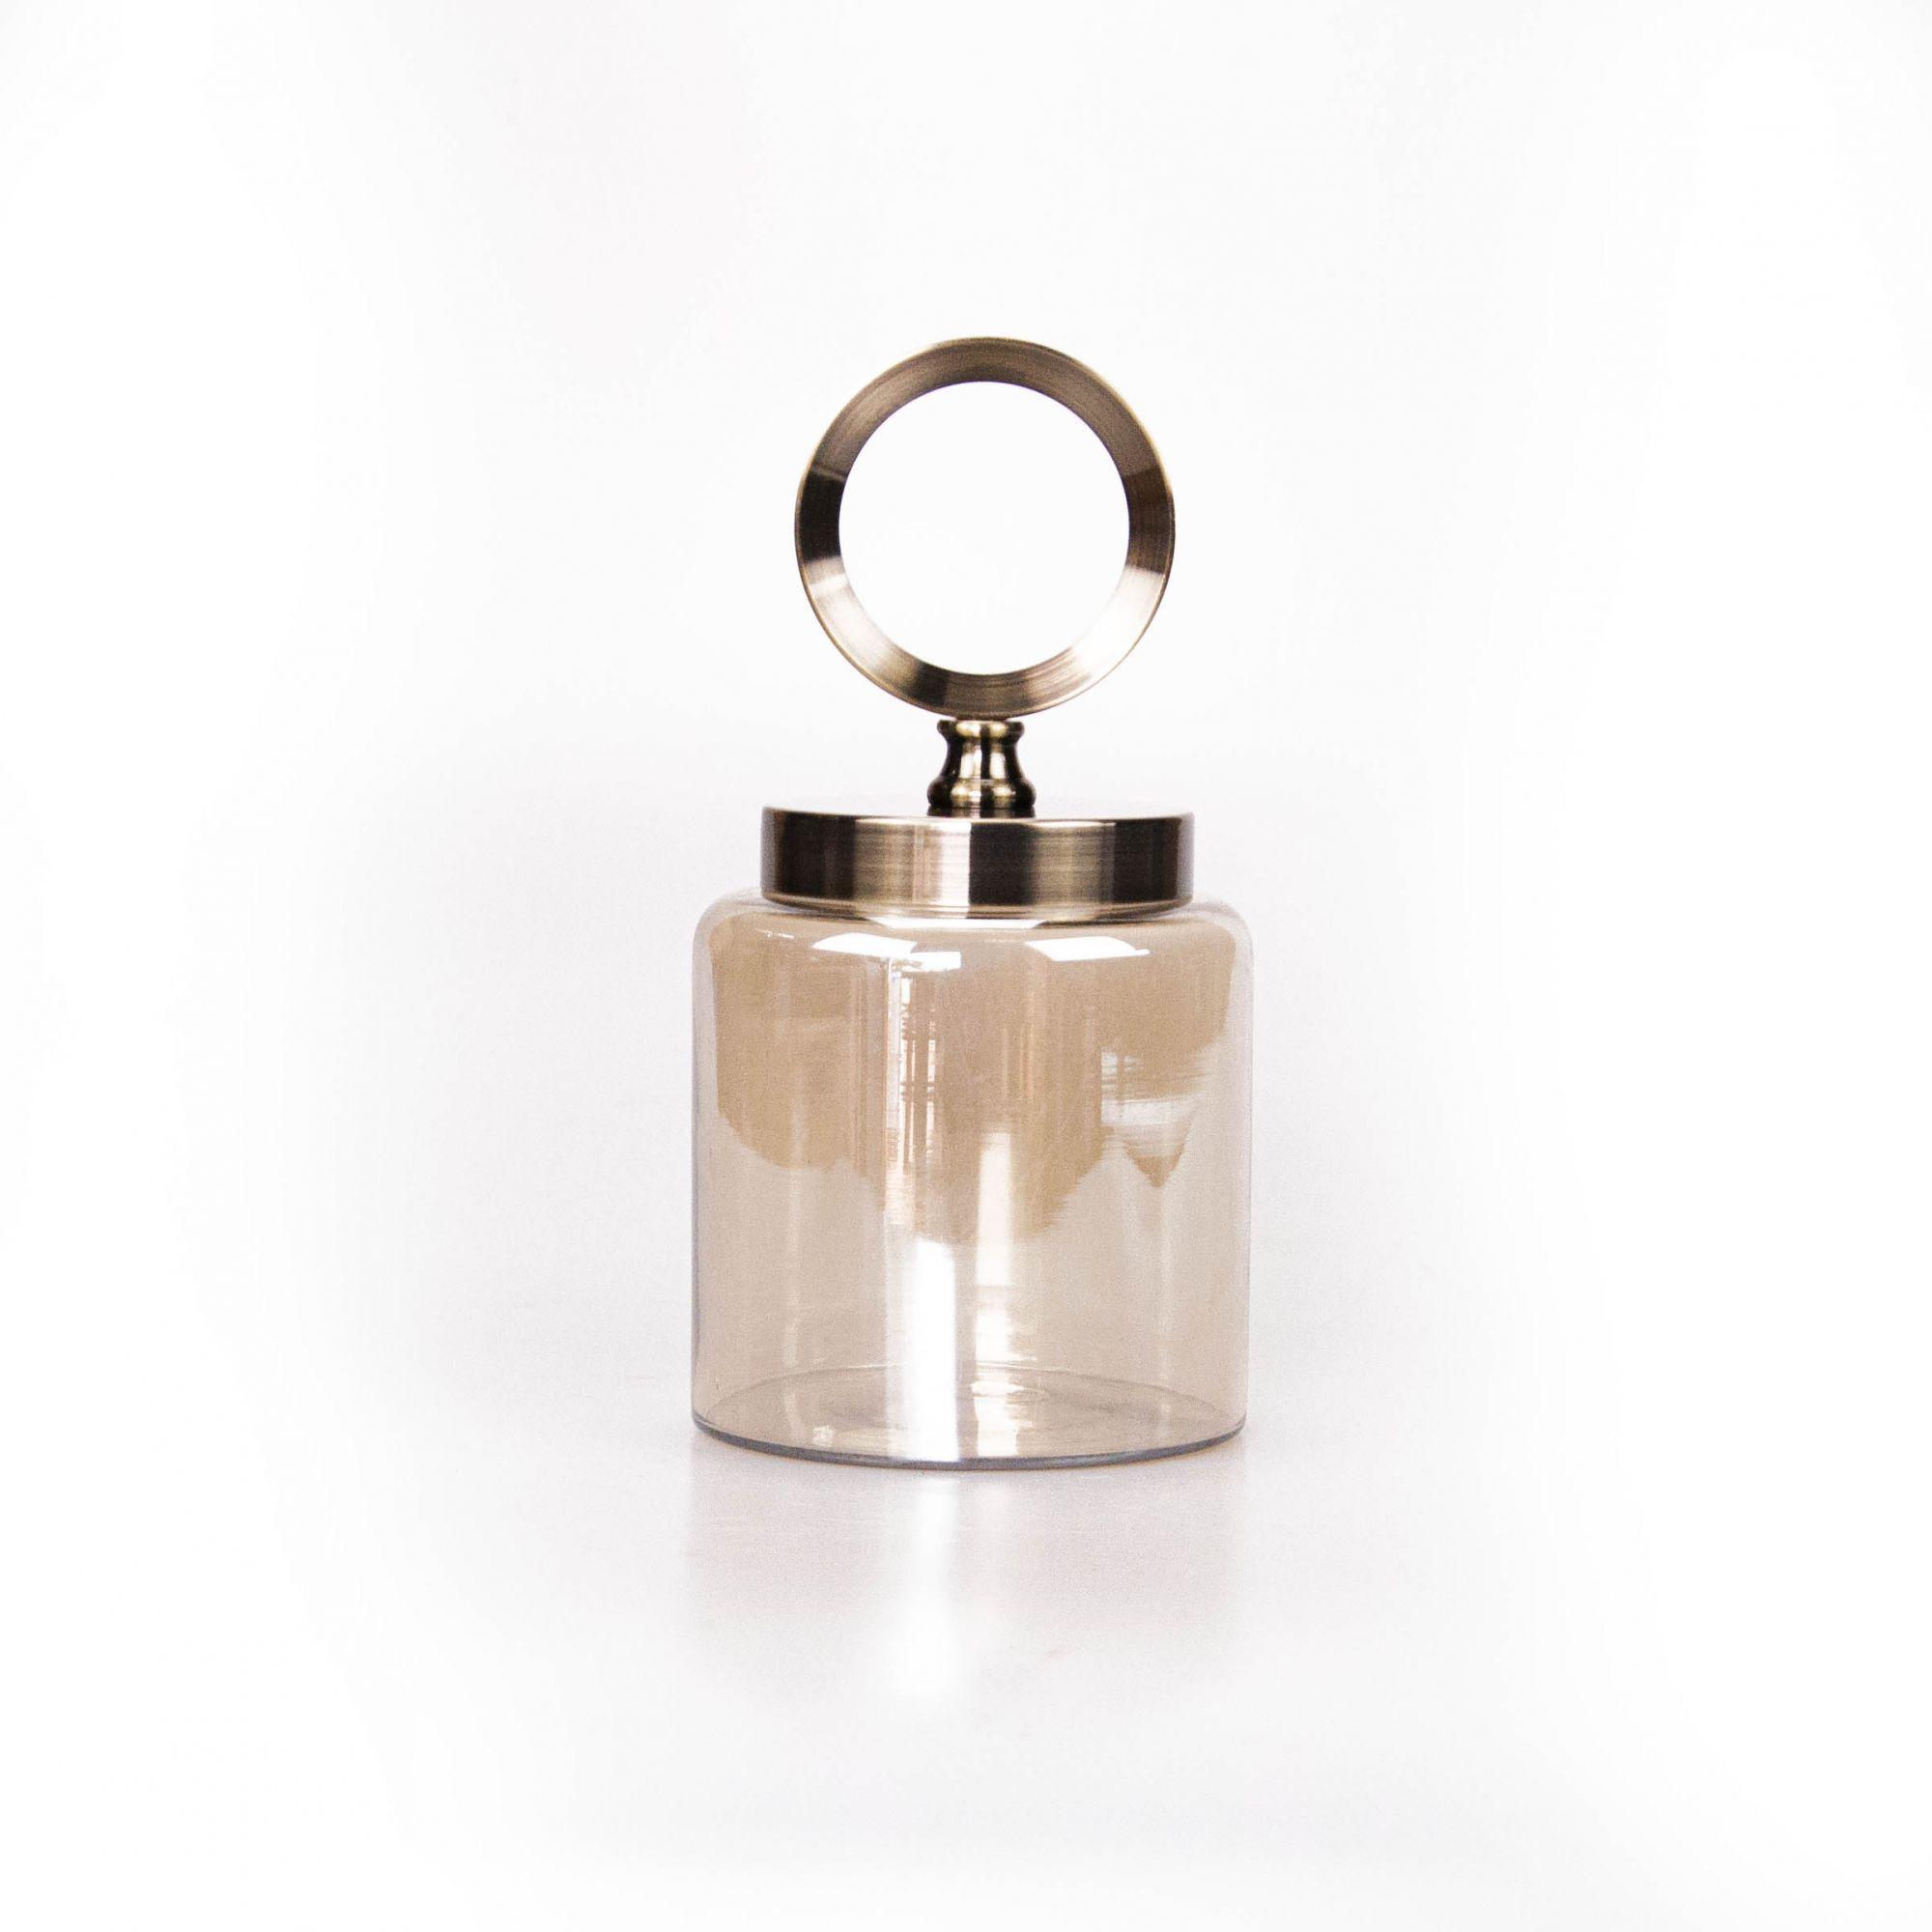 Vaso Decor 50 x 19 cm (Dispon. em 03 medidas) cod 61043 61044 61045